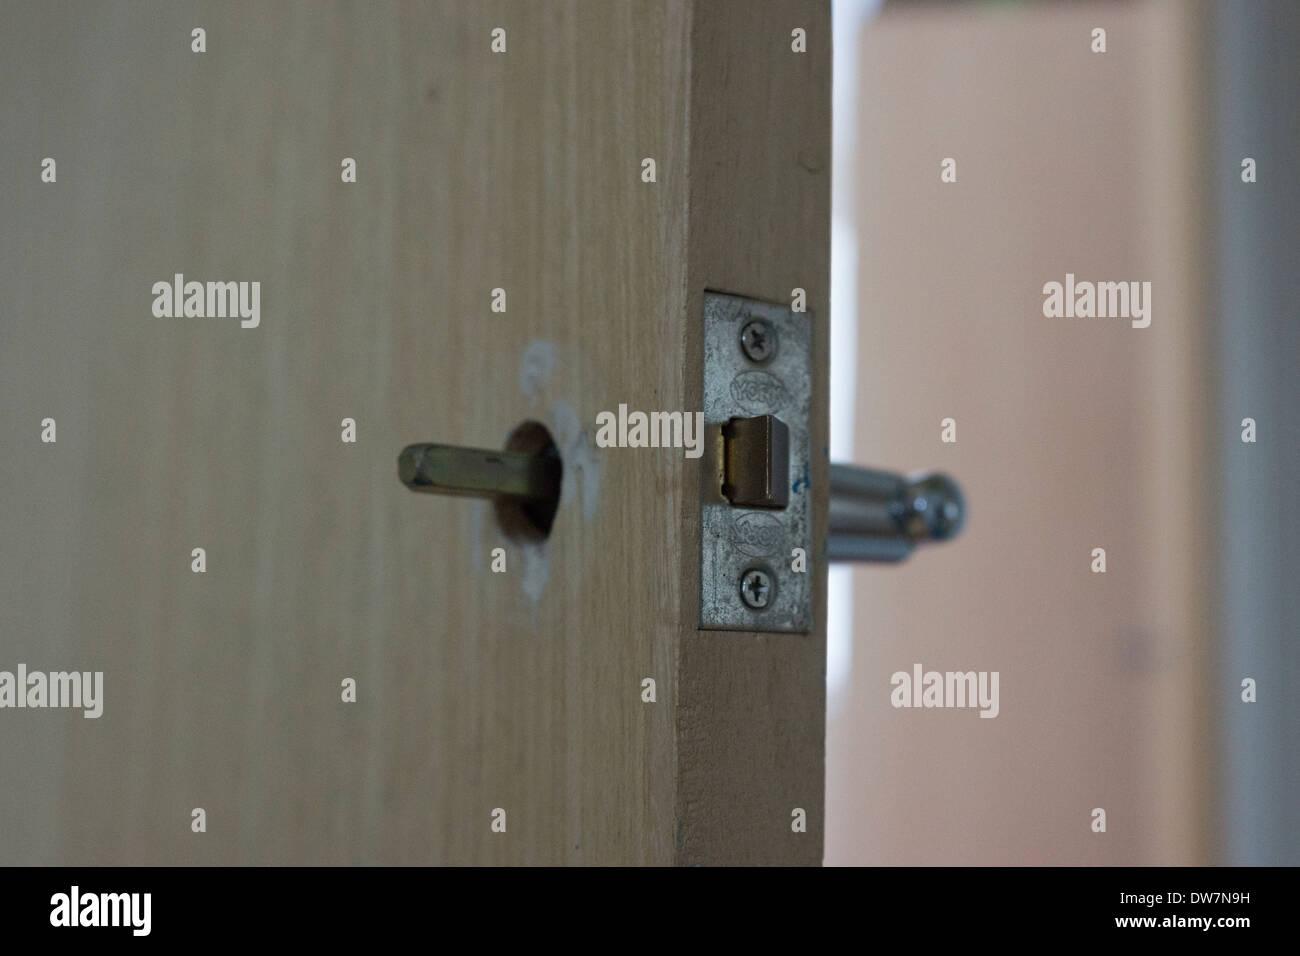 How do you repair broken wood handles?